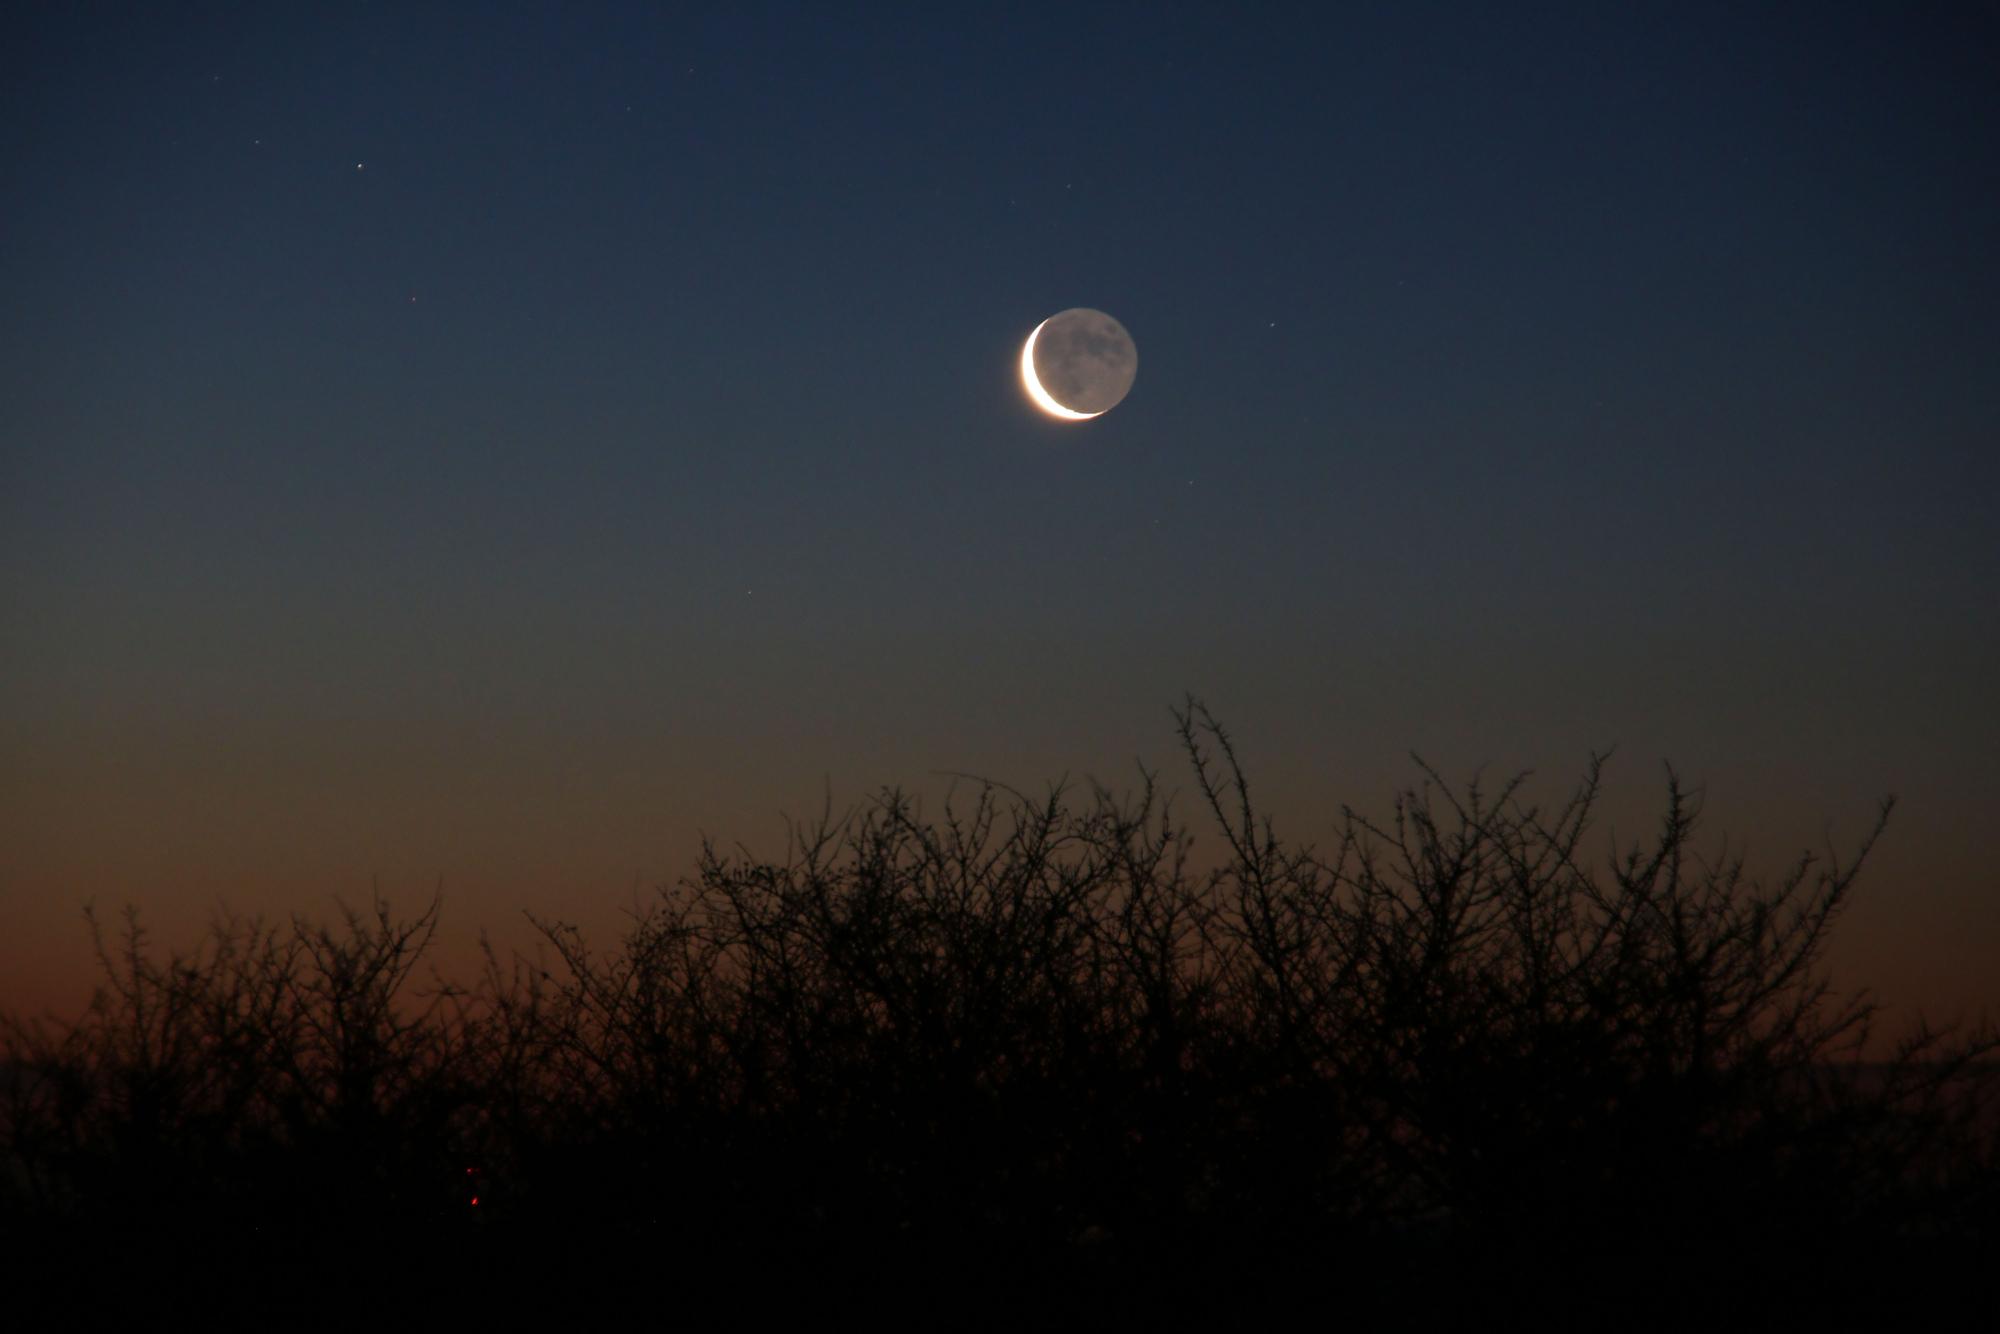 3 b Lune cendrée 1155B1N1 send.jpg